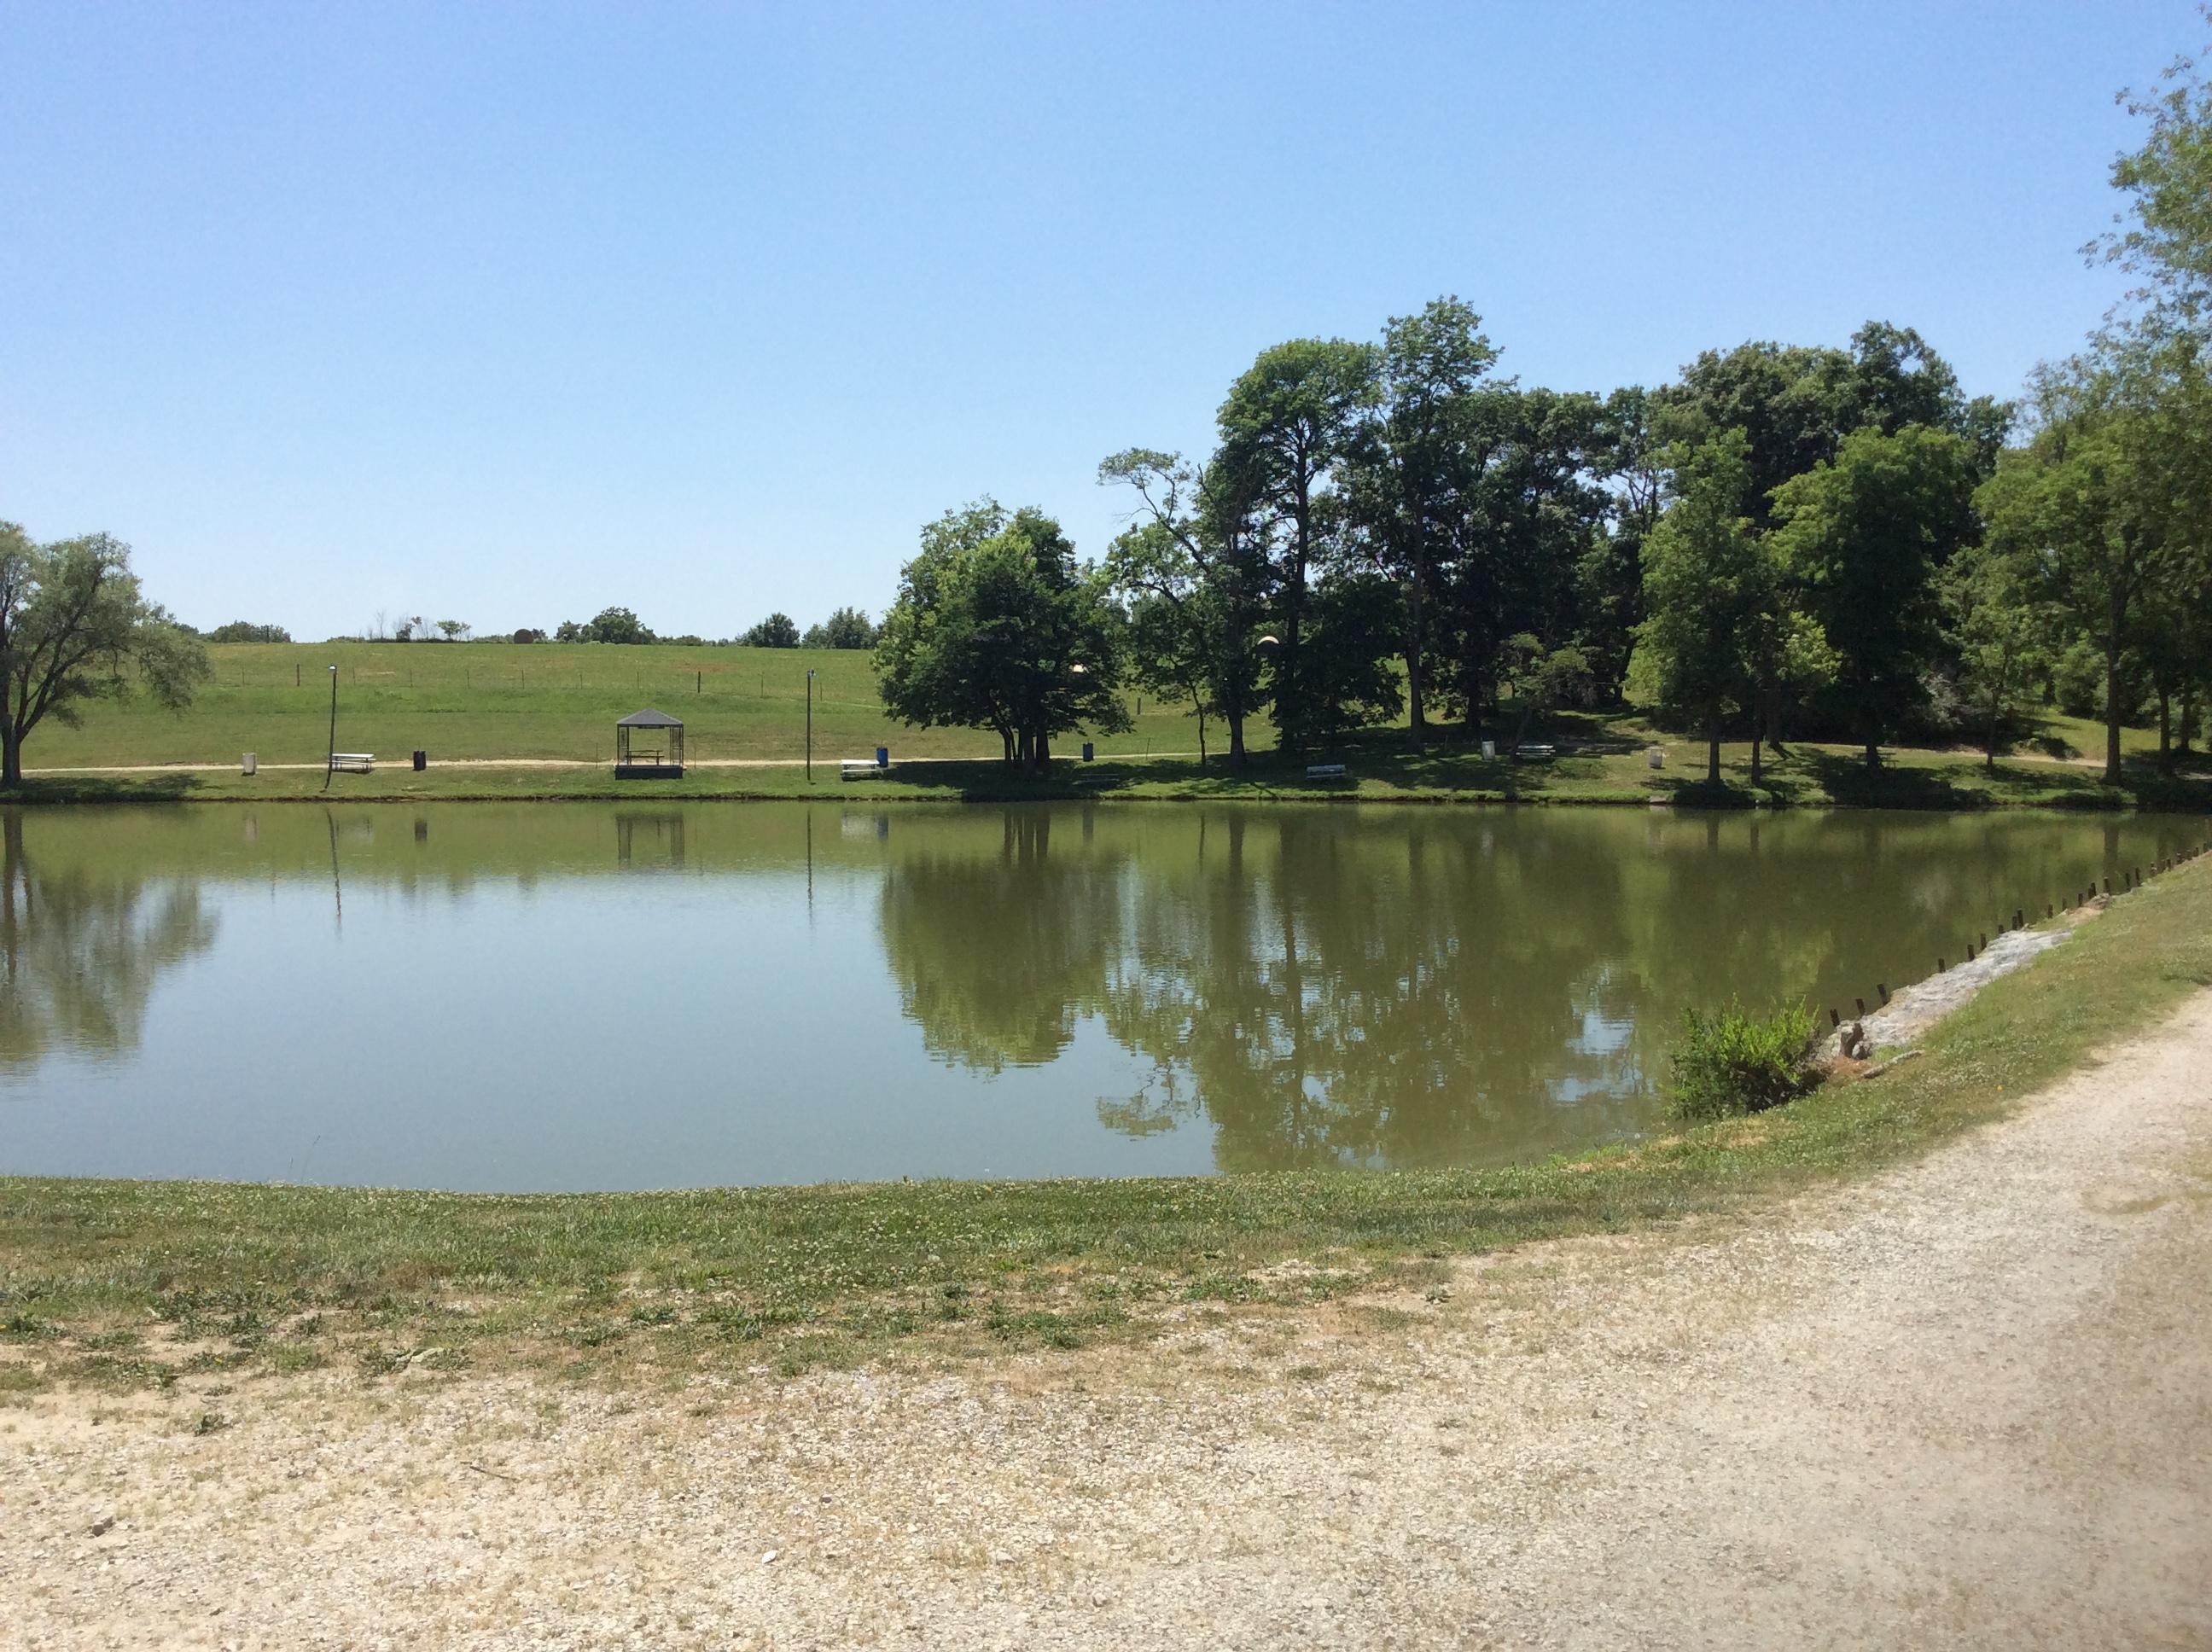 Bob 39 s fishing lake camp grounds in savannah mo 64485 for Fishing lakes in missouri